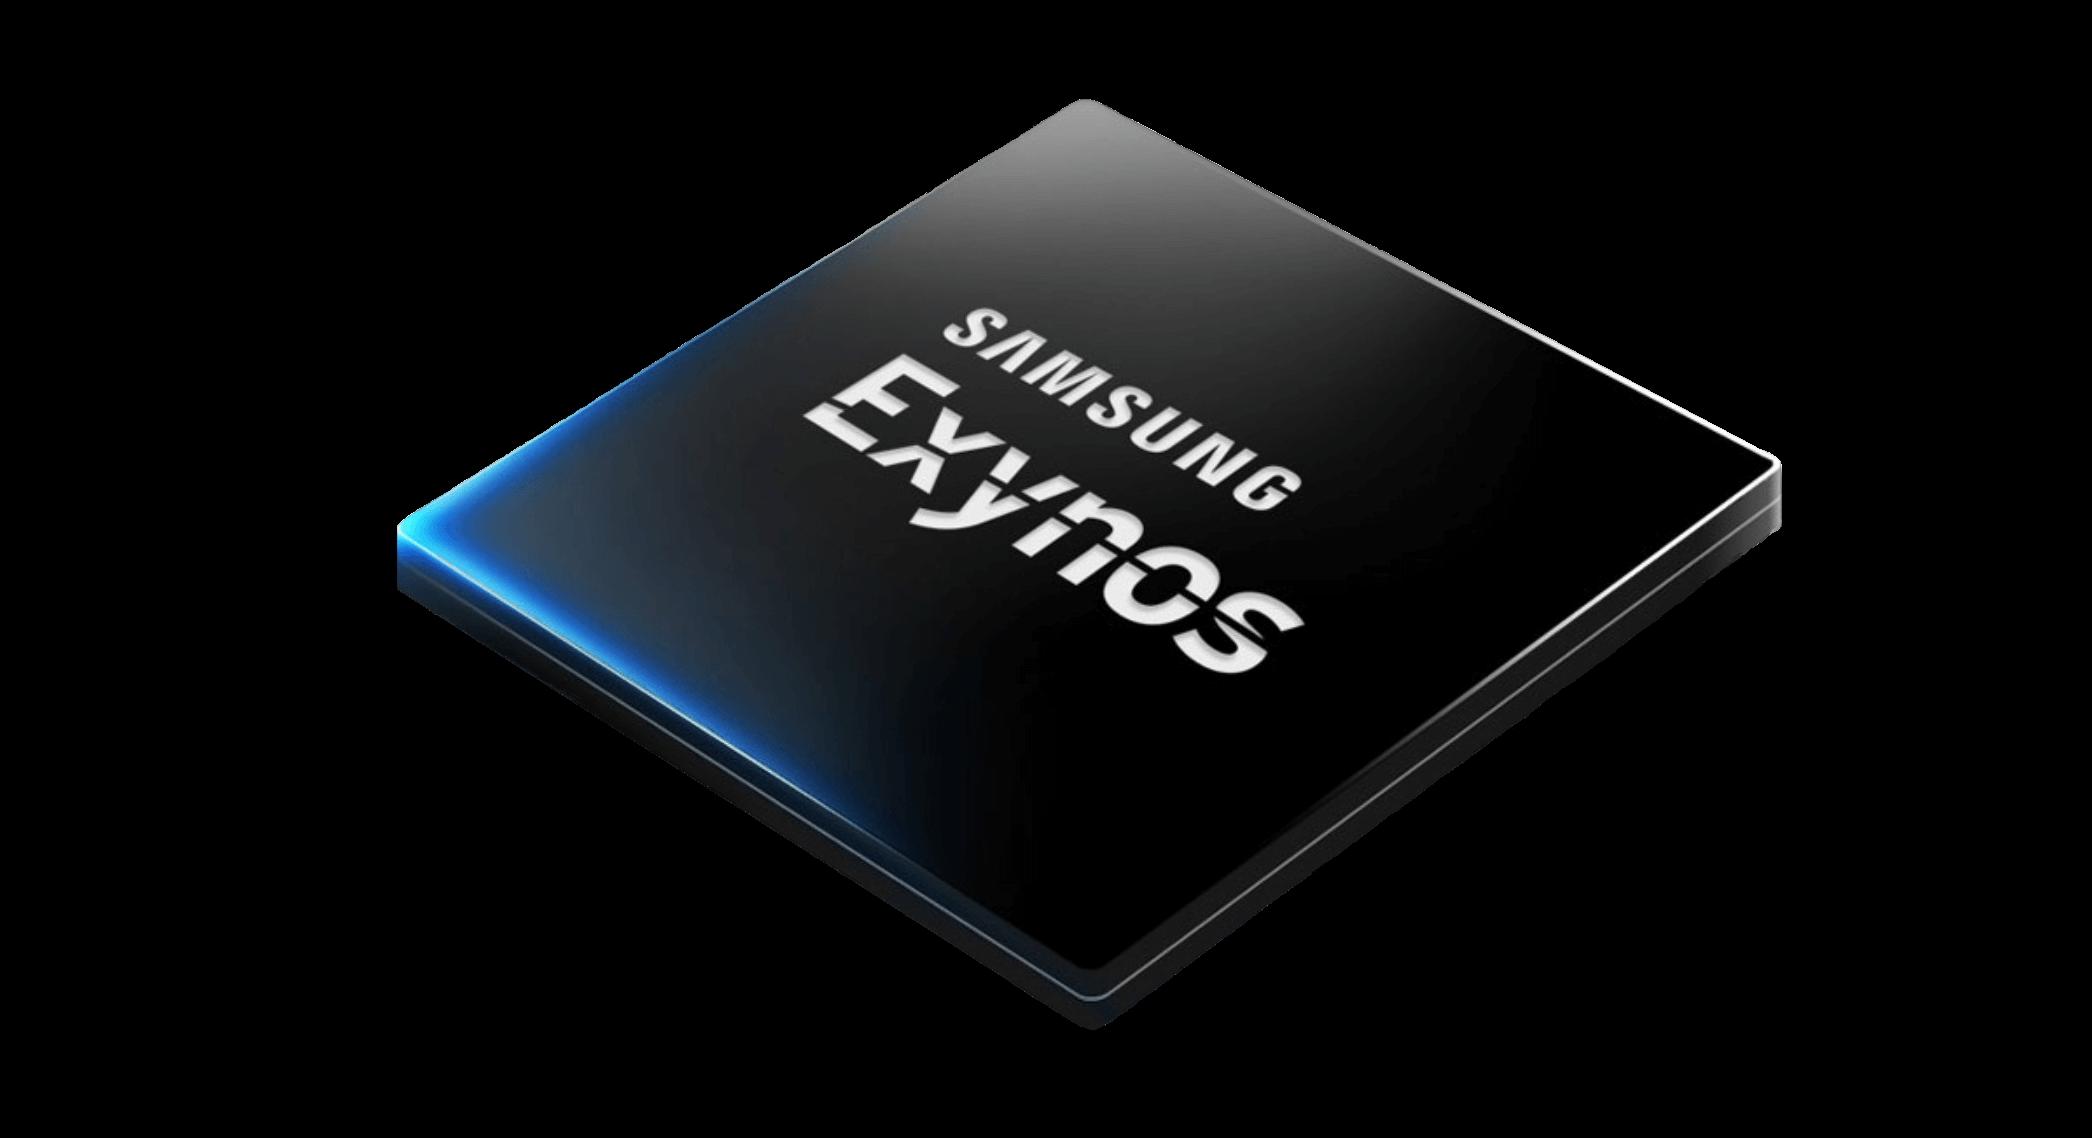 Samsung chce vytvořit Exynos procesor pro počítače s Windows